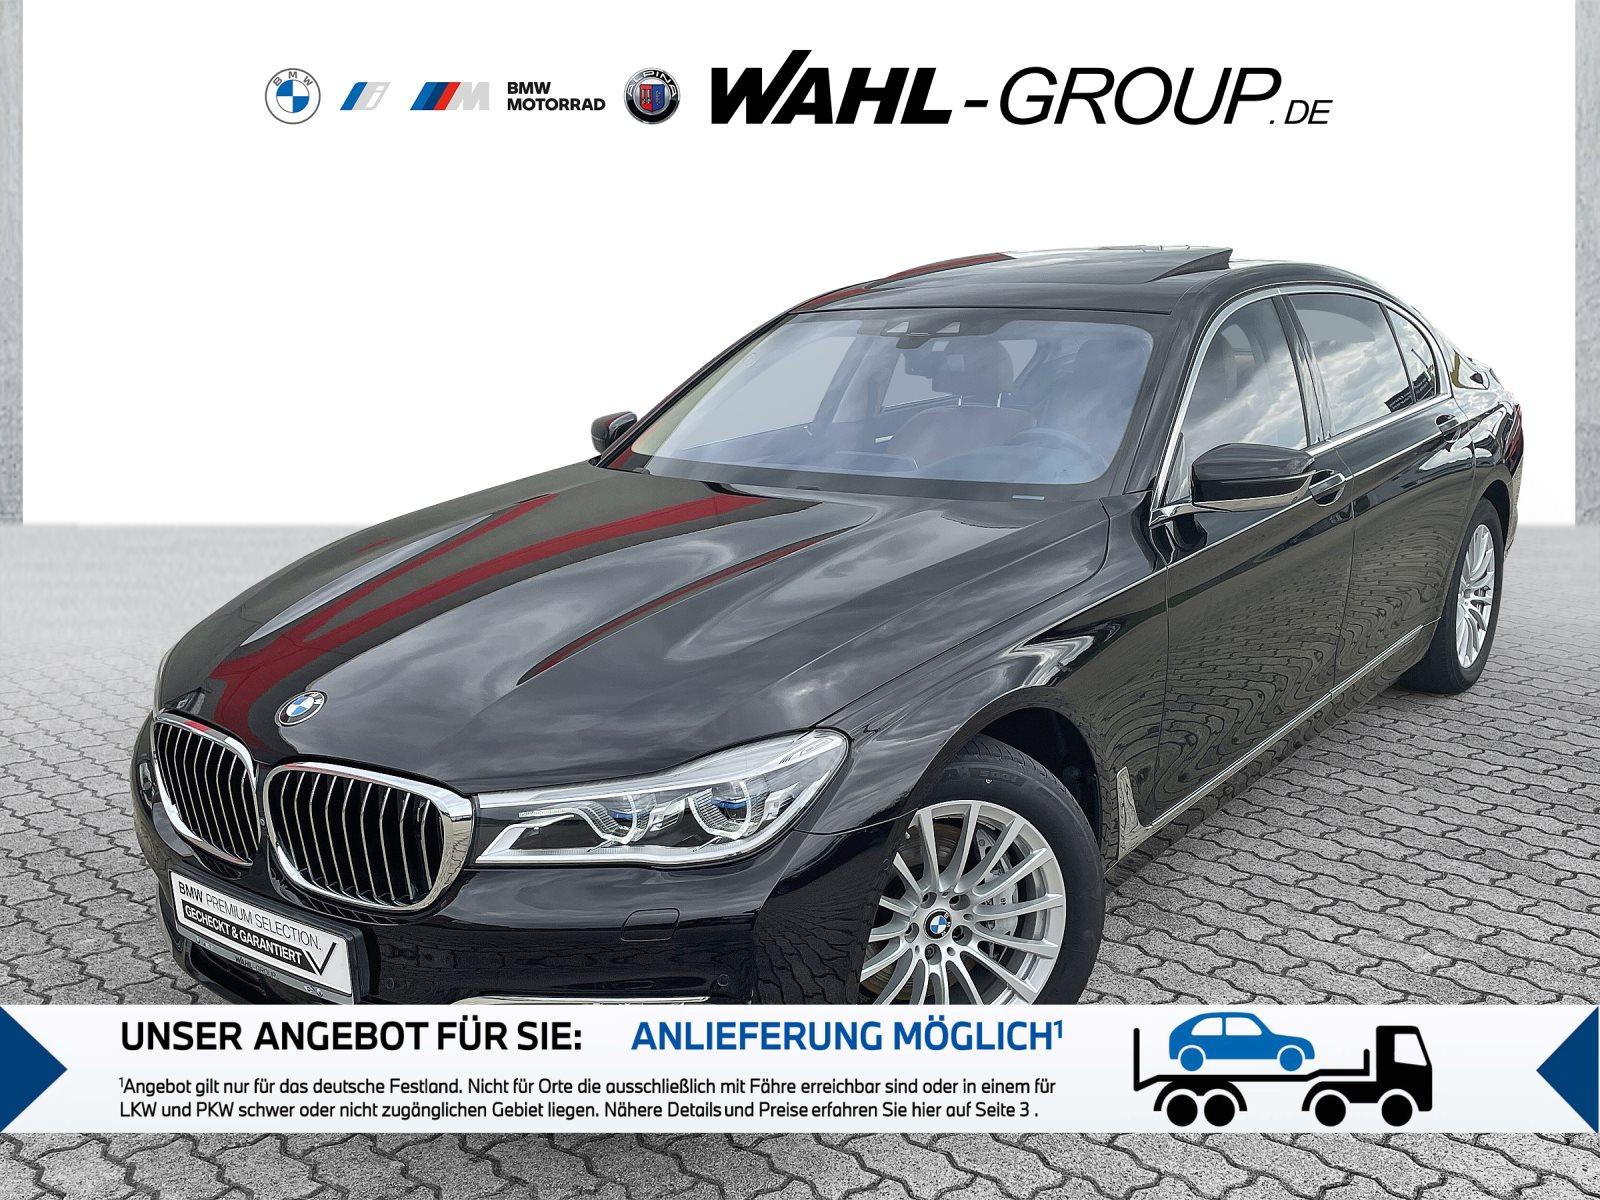 BMW 740d Ld xDrive | Executive | VOLLAUSSTATTUNG, Jahr 2017, Diesel